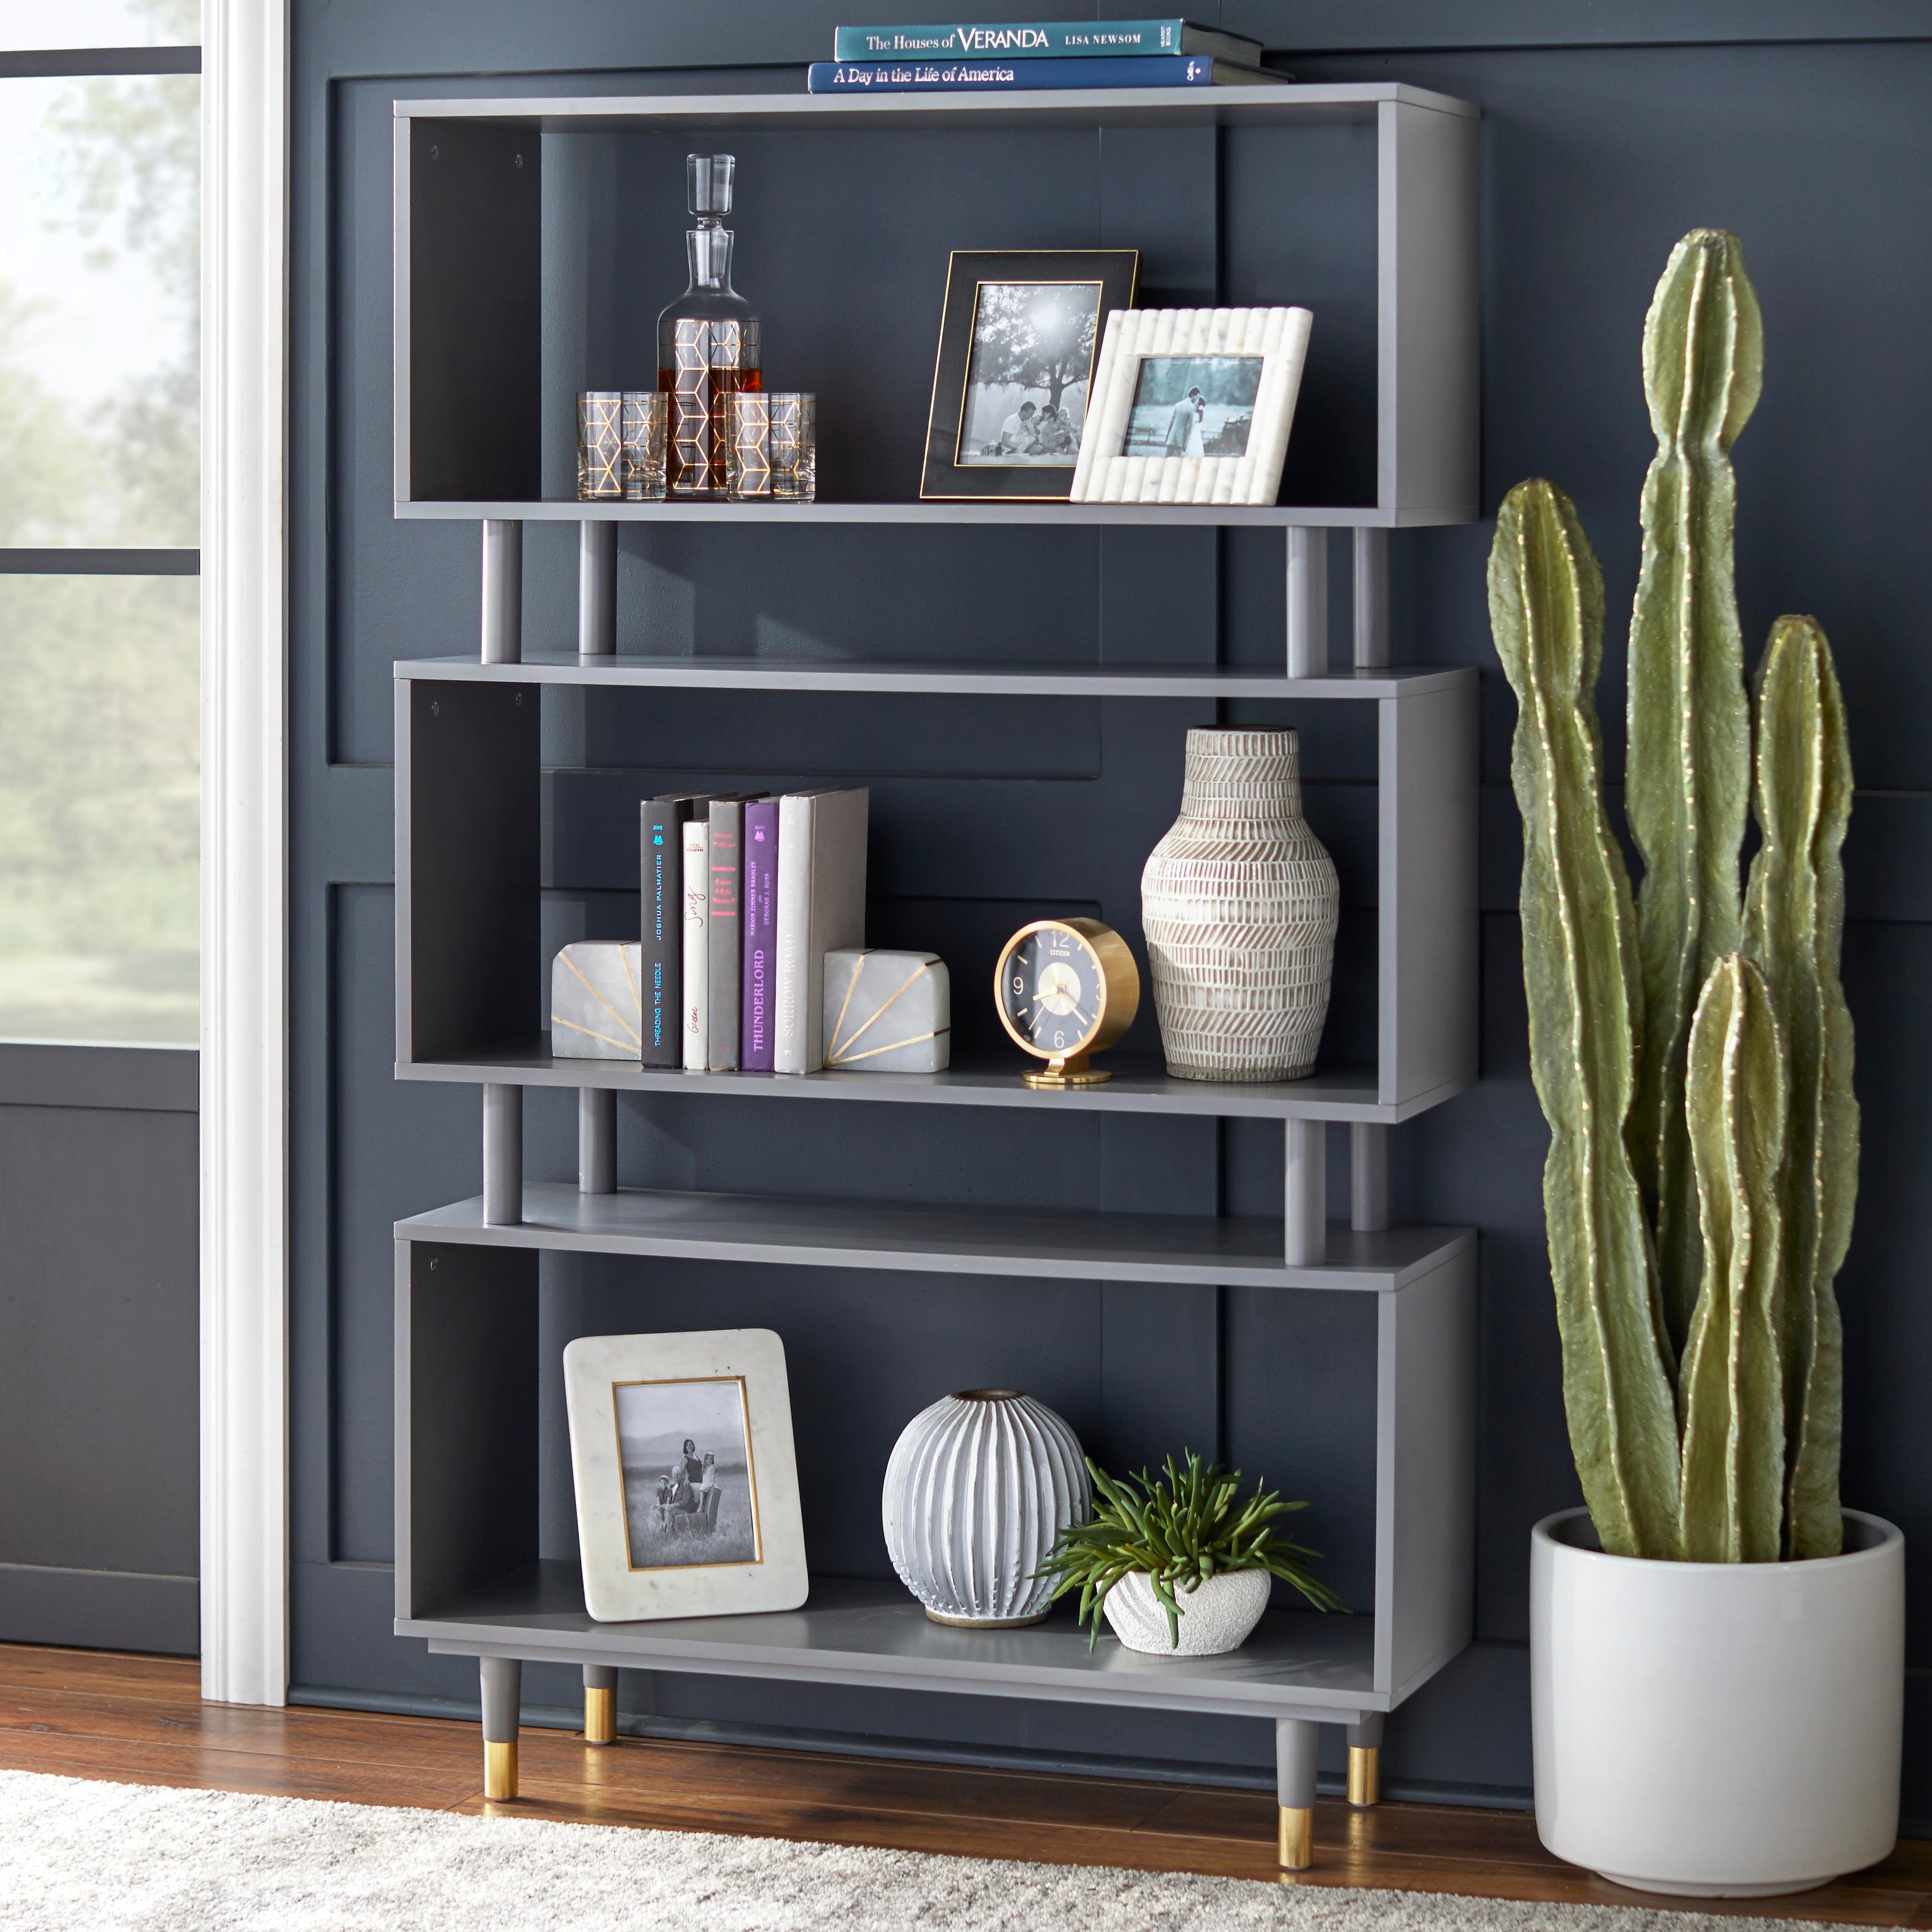 Image of: Shop Black Friday Deals On Simple Living Margo Mid Century 3 Shelf Bookshelf 59 5 H X 36 W X 11 8 D On Sale Overstock 10655448